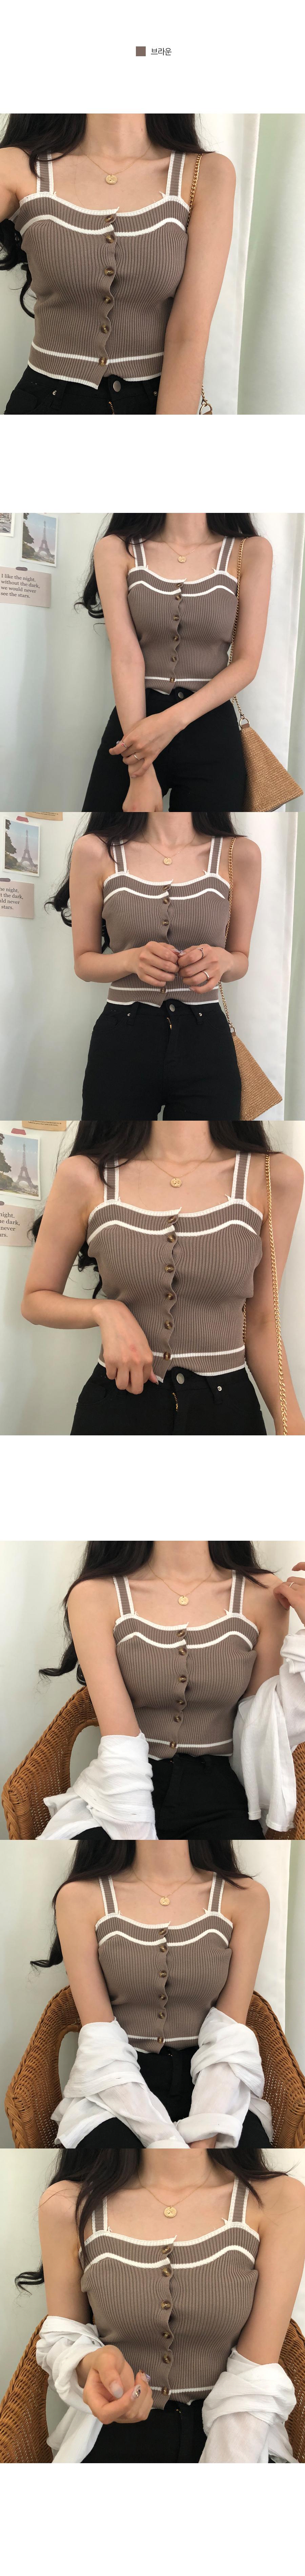 Julai Color Knitwear Sleeveless